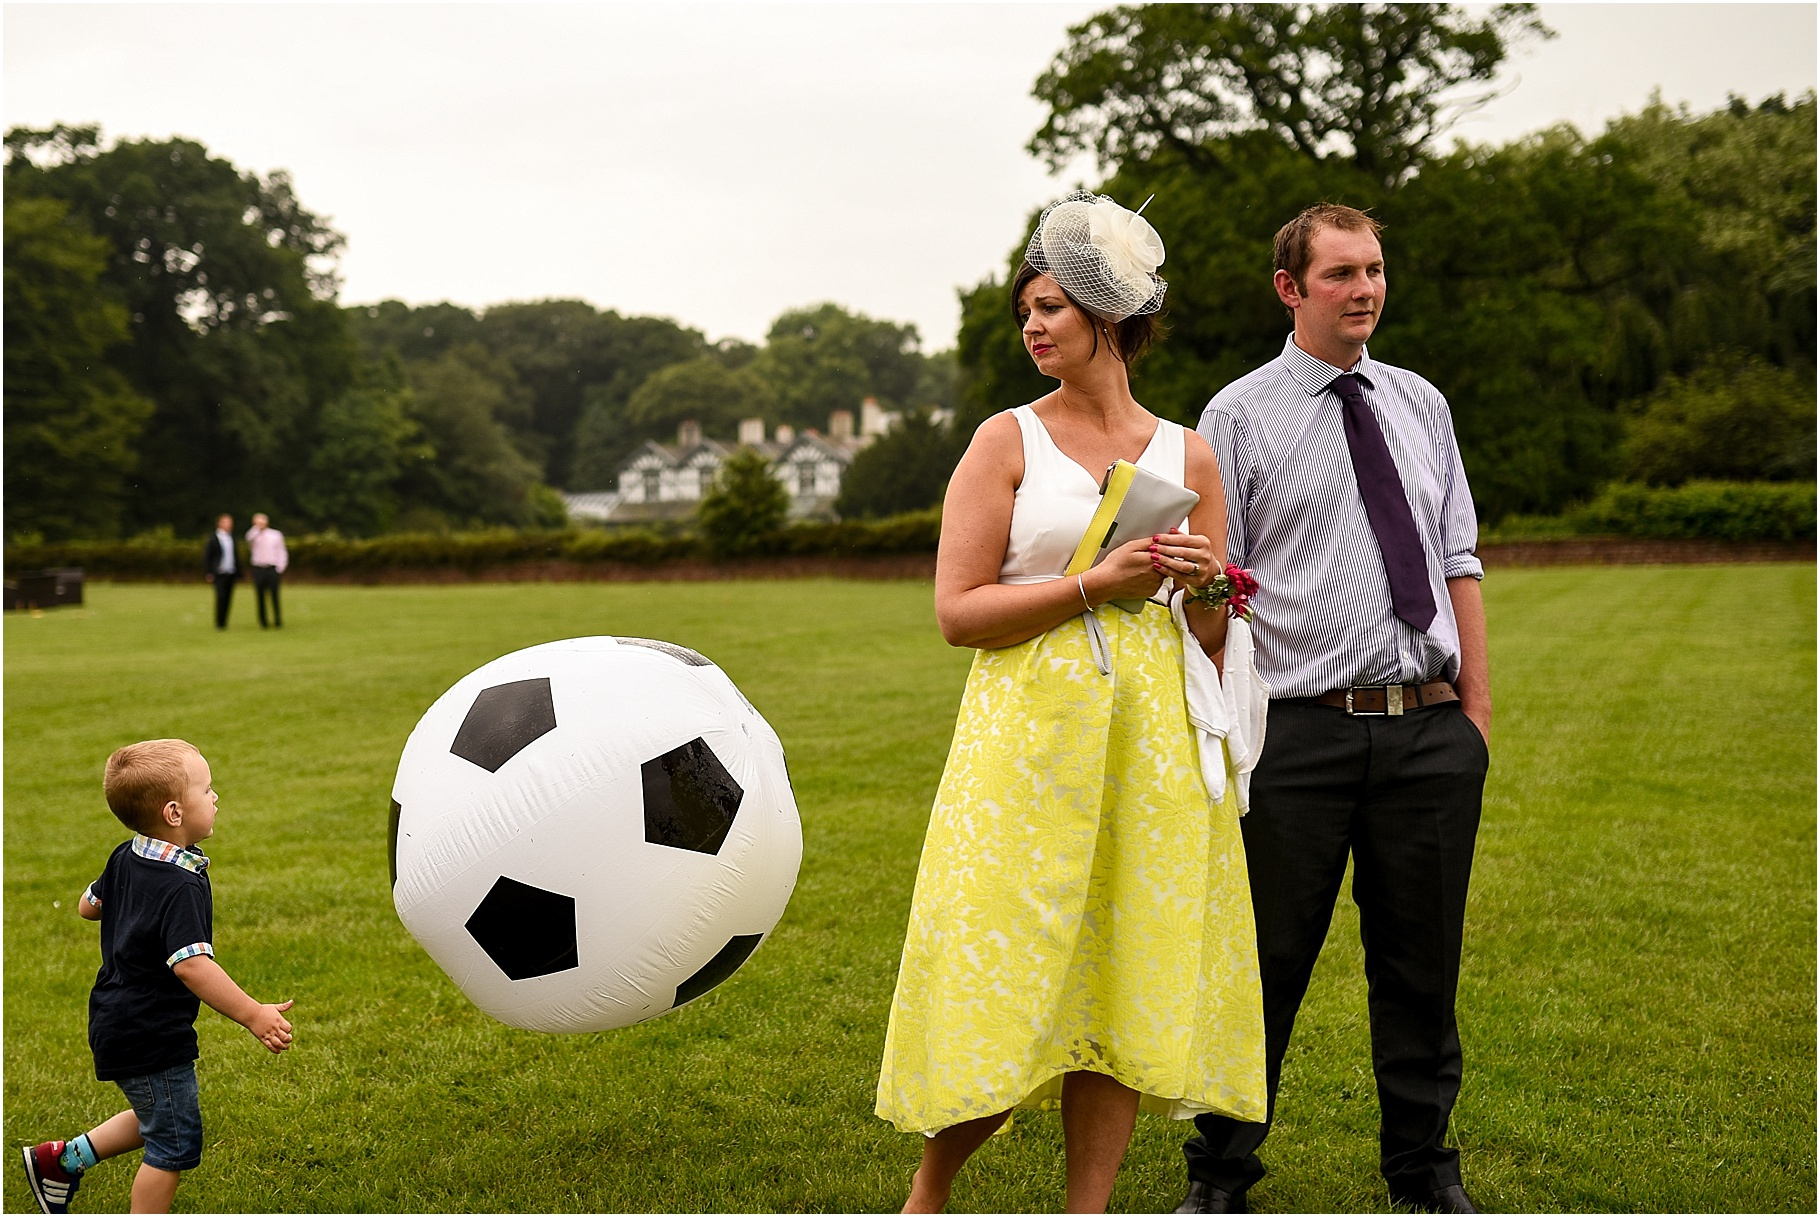 lancashire-marquee-wedding-084.jpg